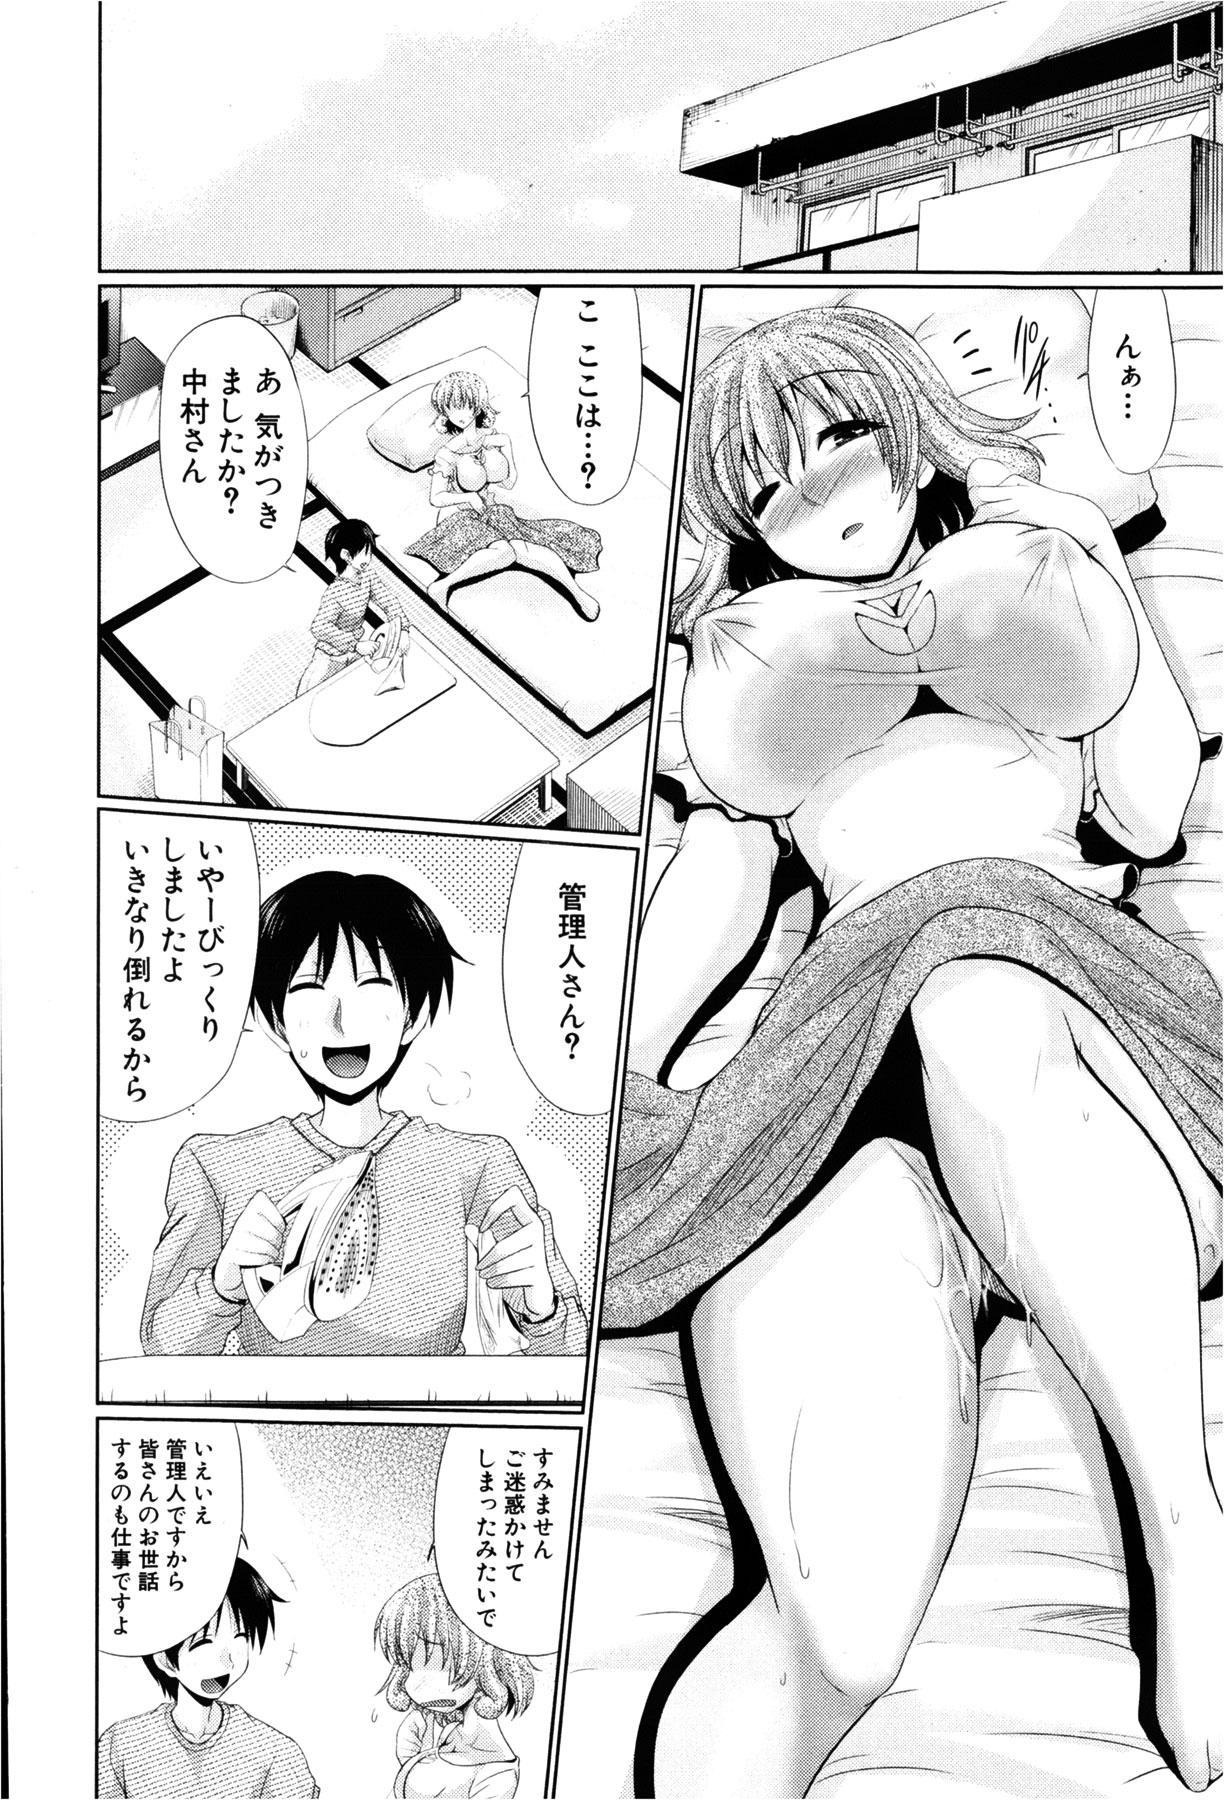 COMIC Shingeki 2013-02 11